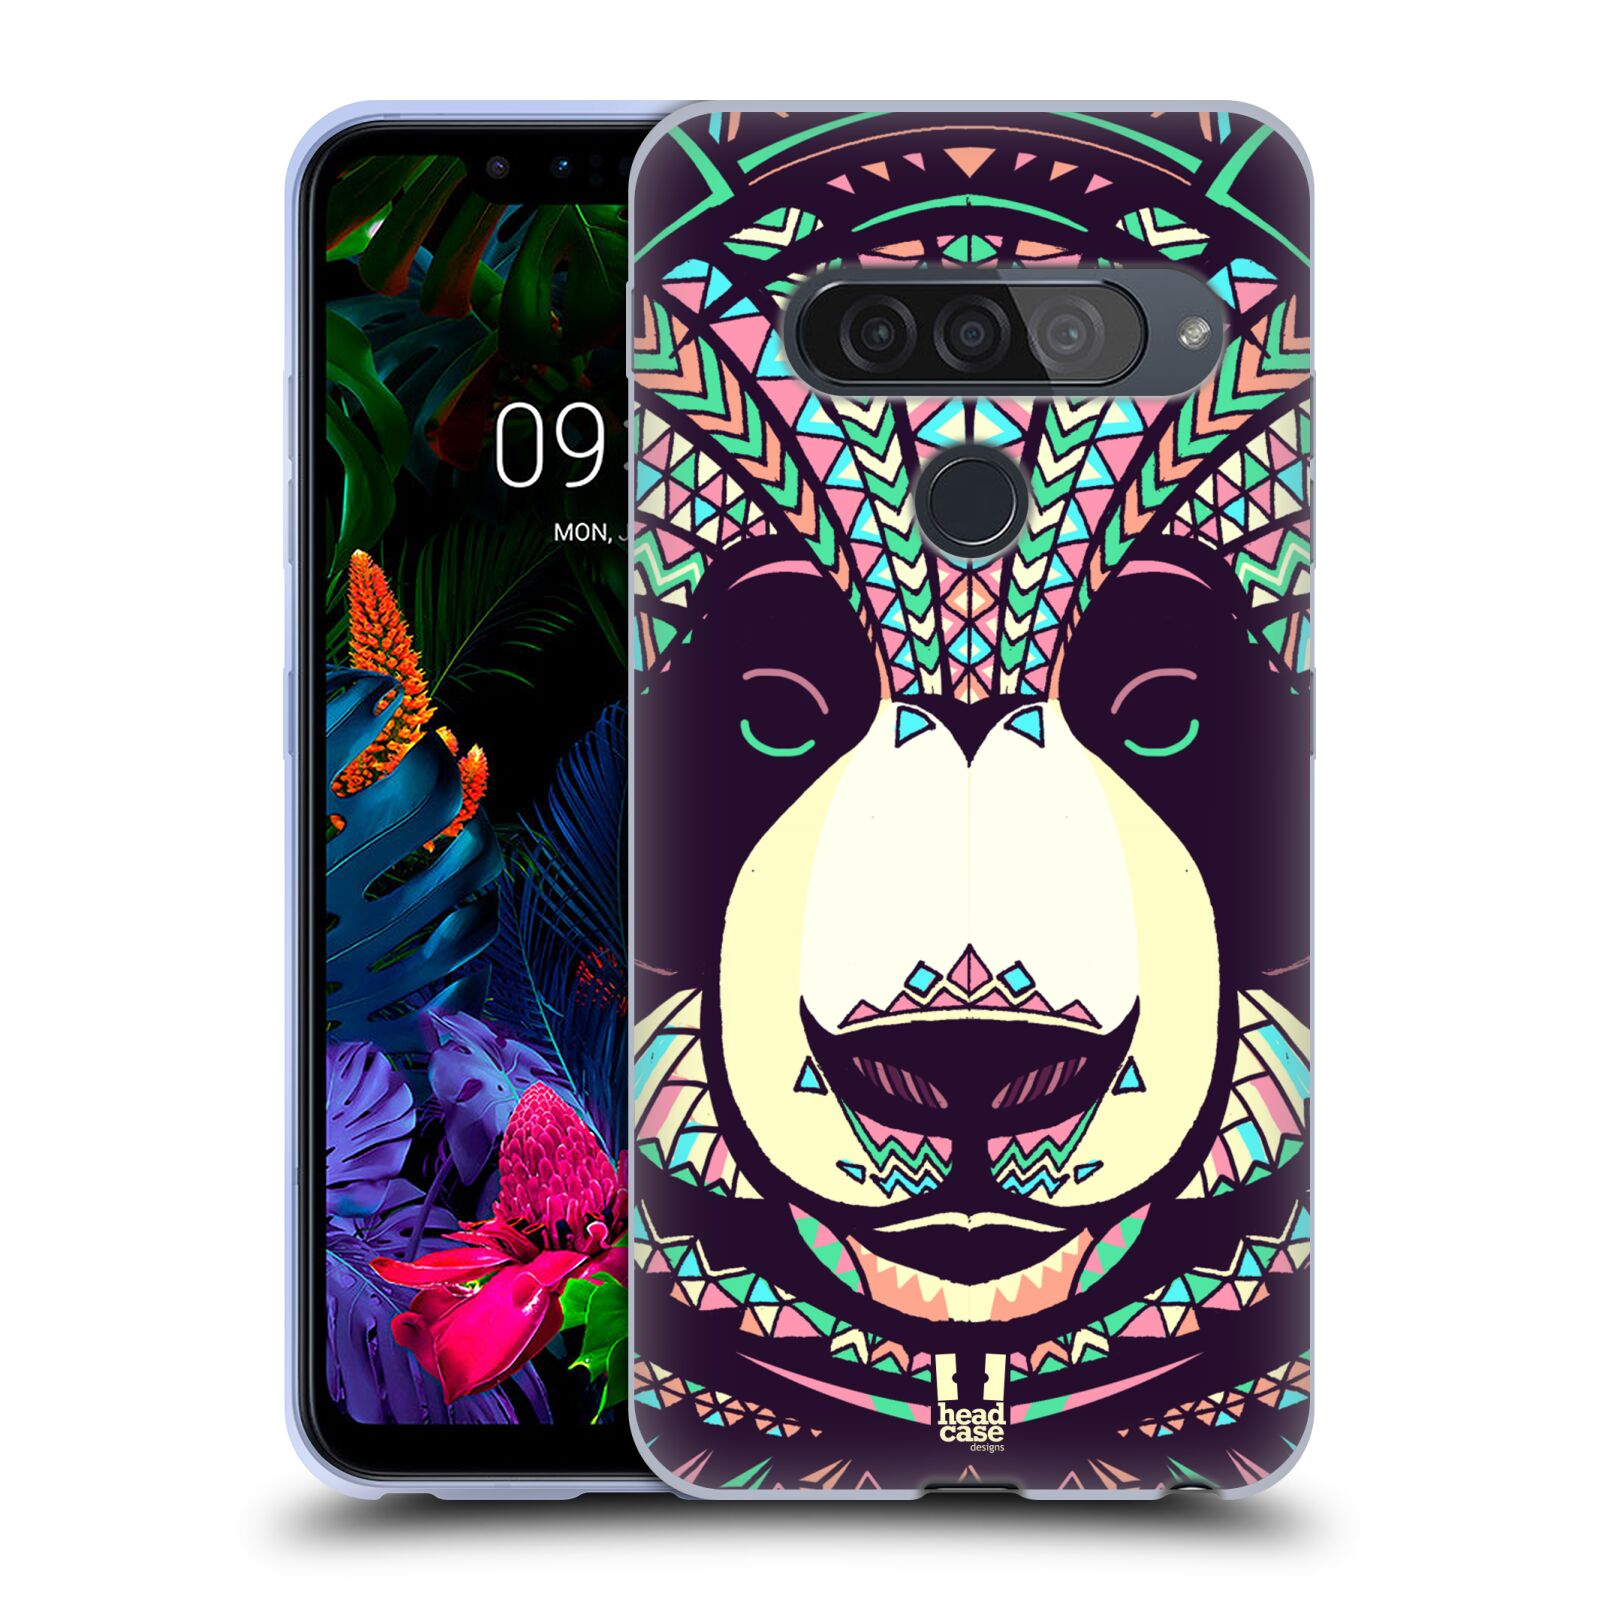 Silikonové pouzdro na mobil LG G8s ThinQ - Head Case - AZTEC PANDA